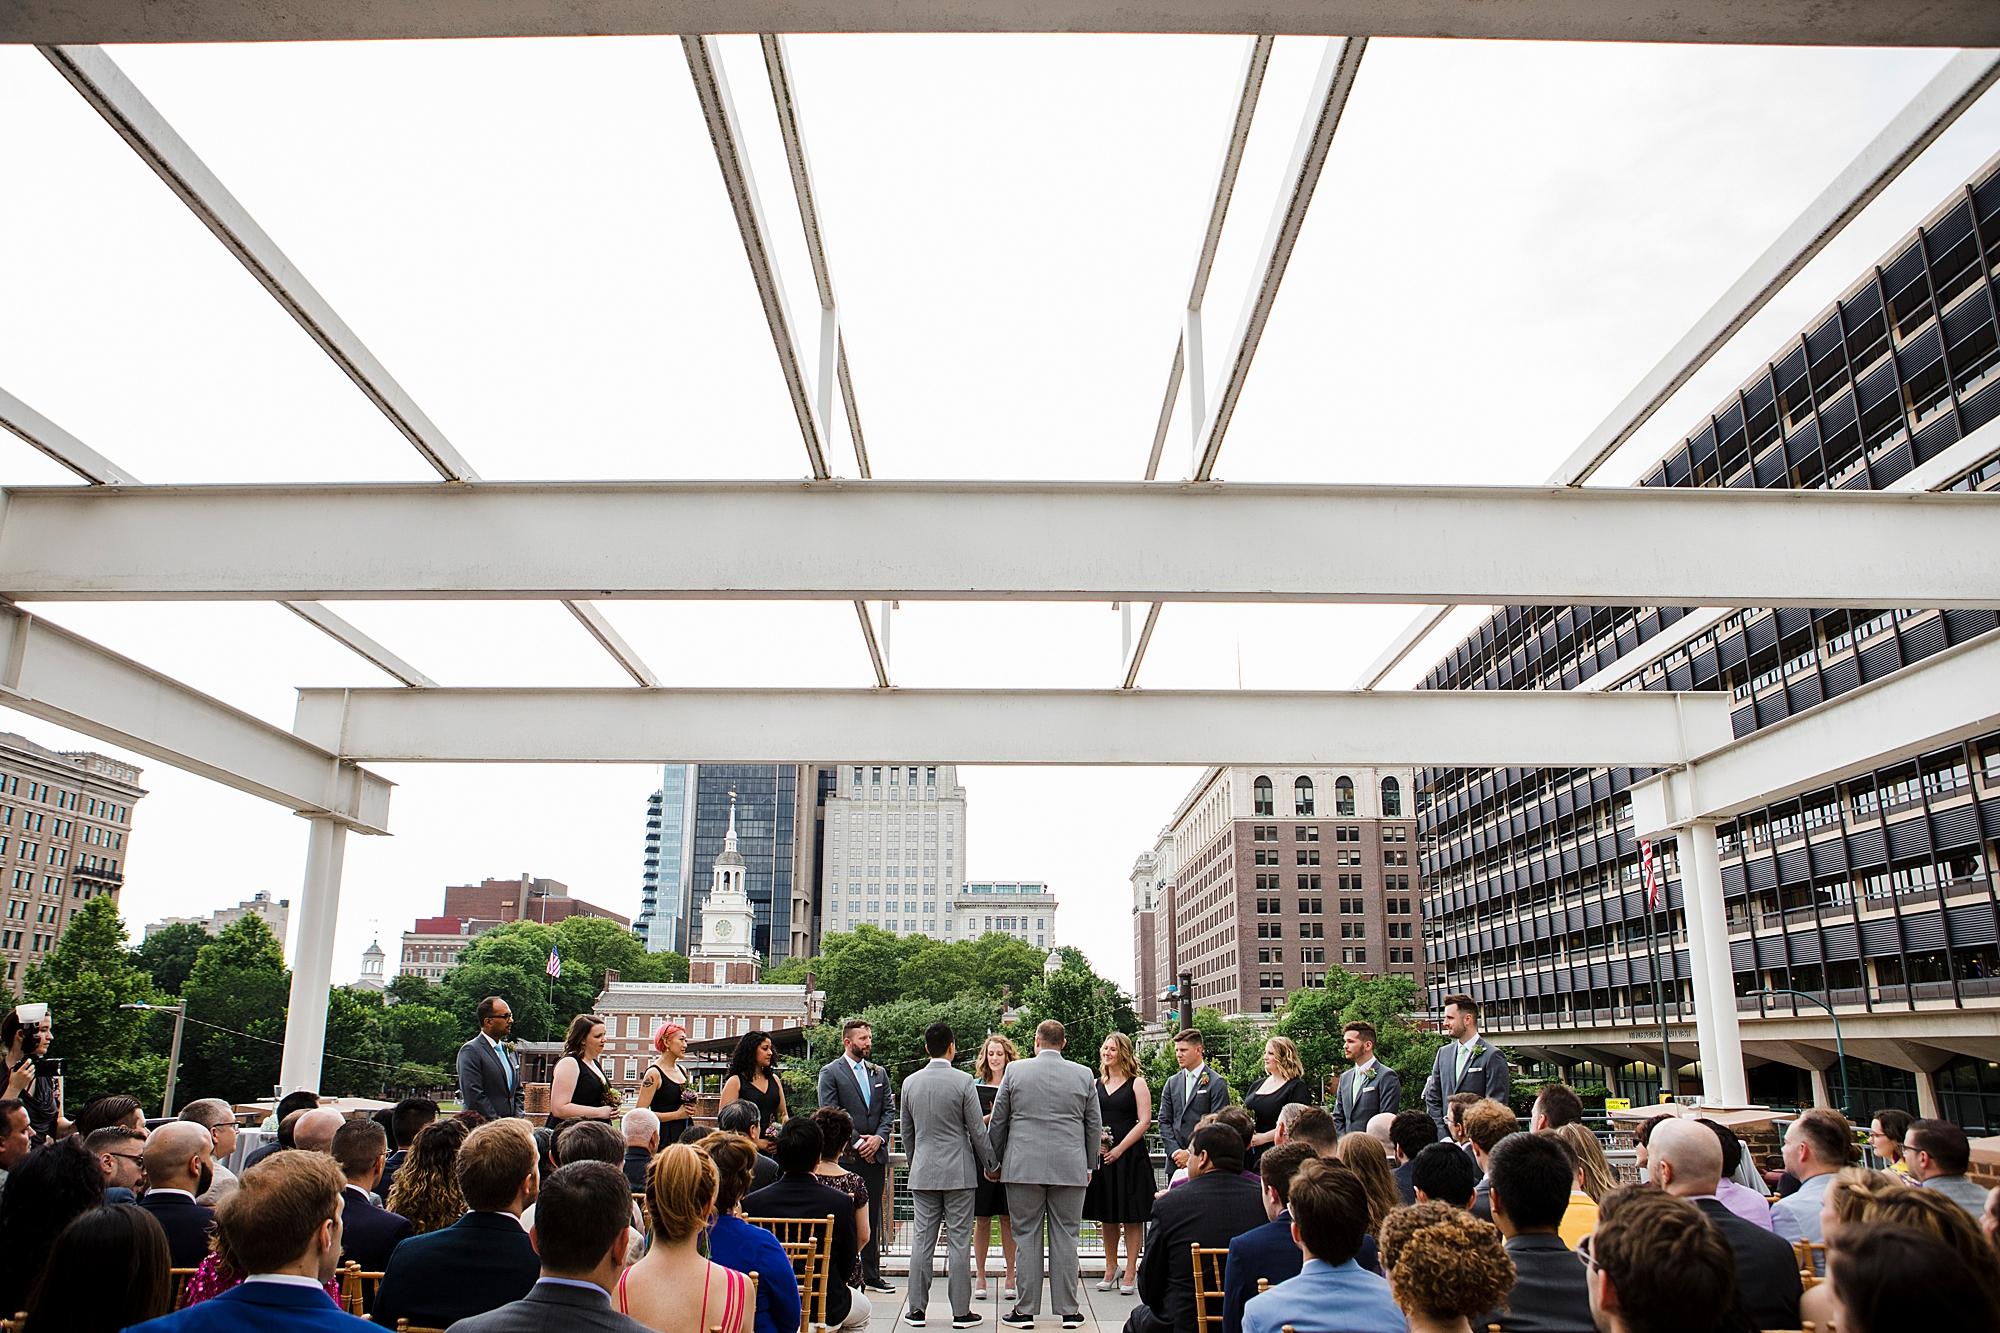 Dan_and_Byron_Love_by_Joe_Mac_Philadelphia_Wedding_LGBTQ_Photography_Gay_Independence_visitor_Center_83.JPG